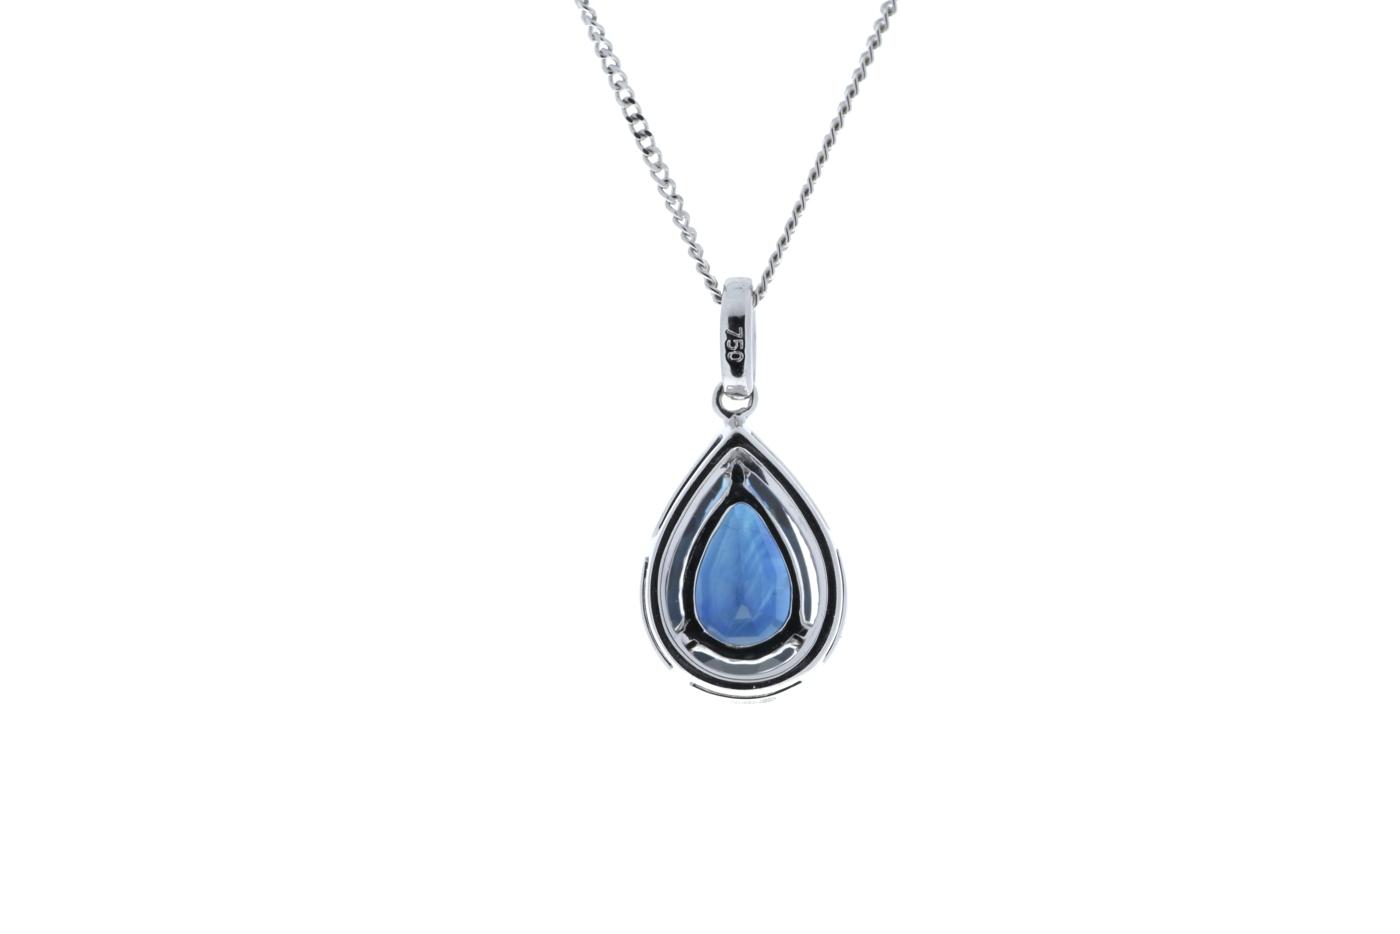 Lot 43 - 18ct White Gold Diamond And Sapphire Pendant 2.35 Carats